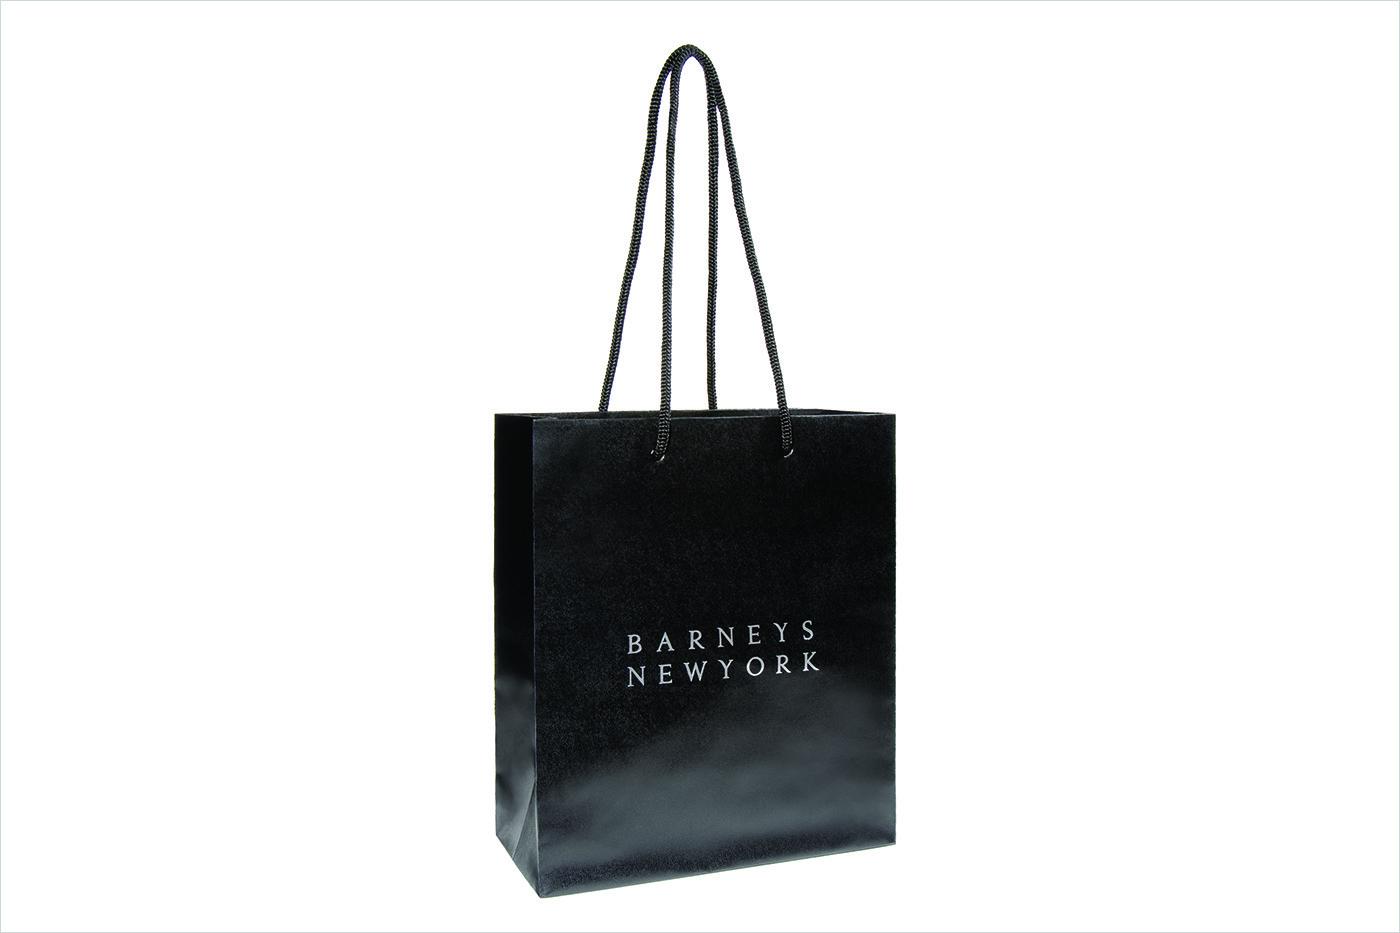 BARNEYS-SHOPPING-BAG-3000x2000.jpg